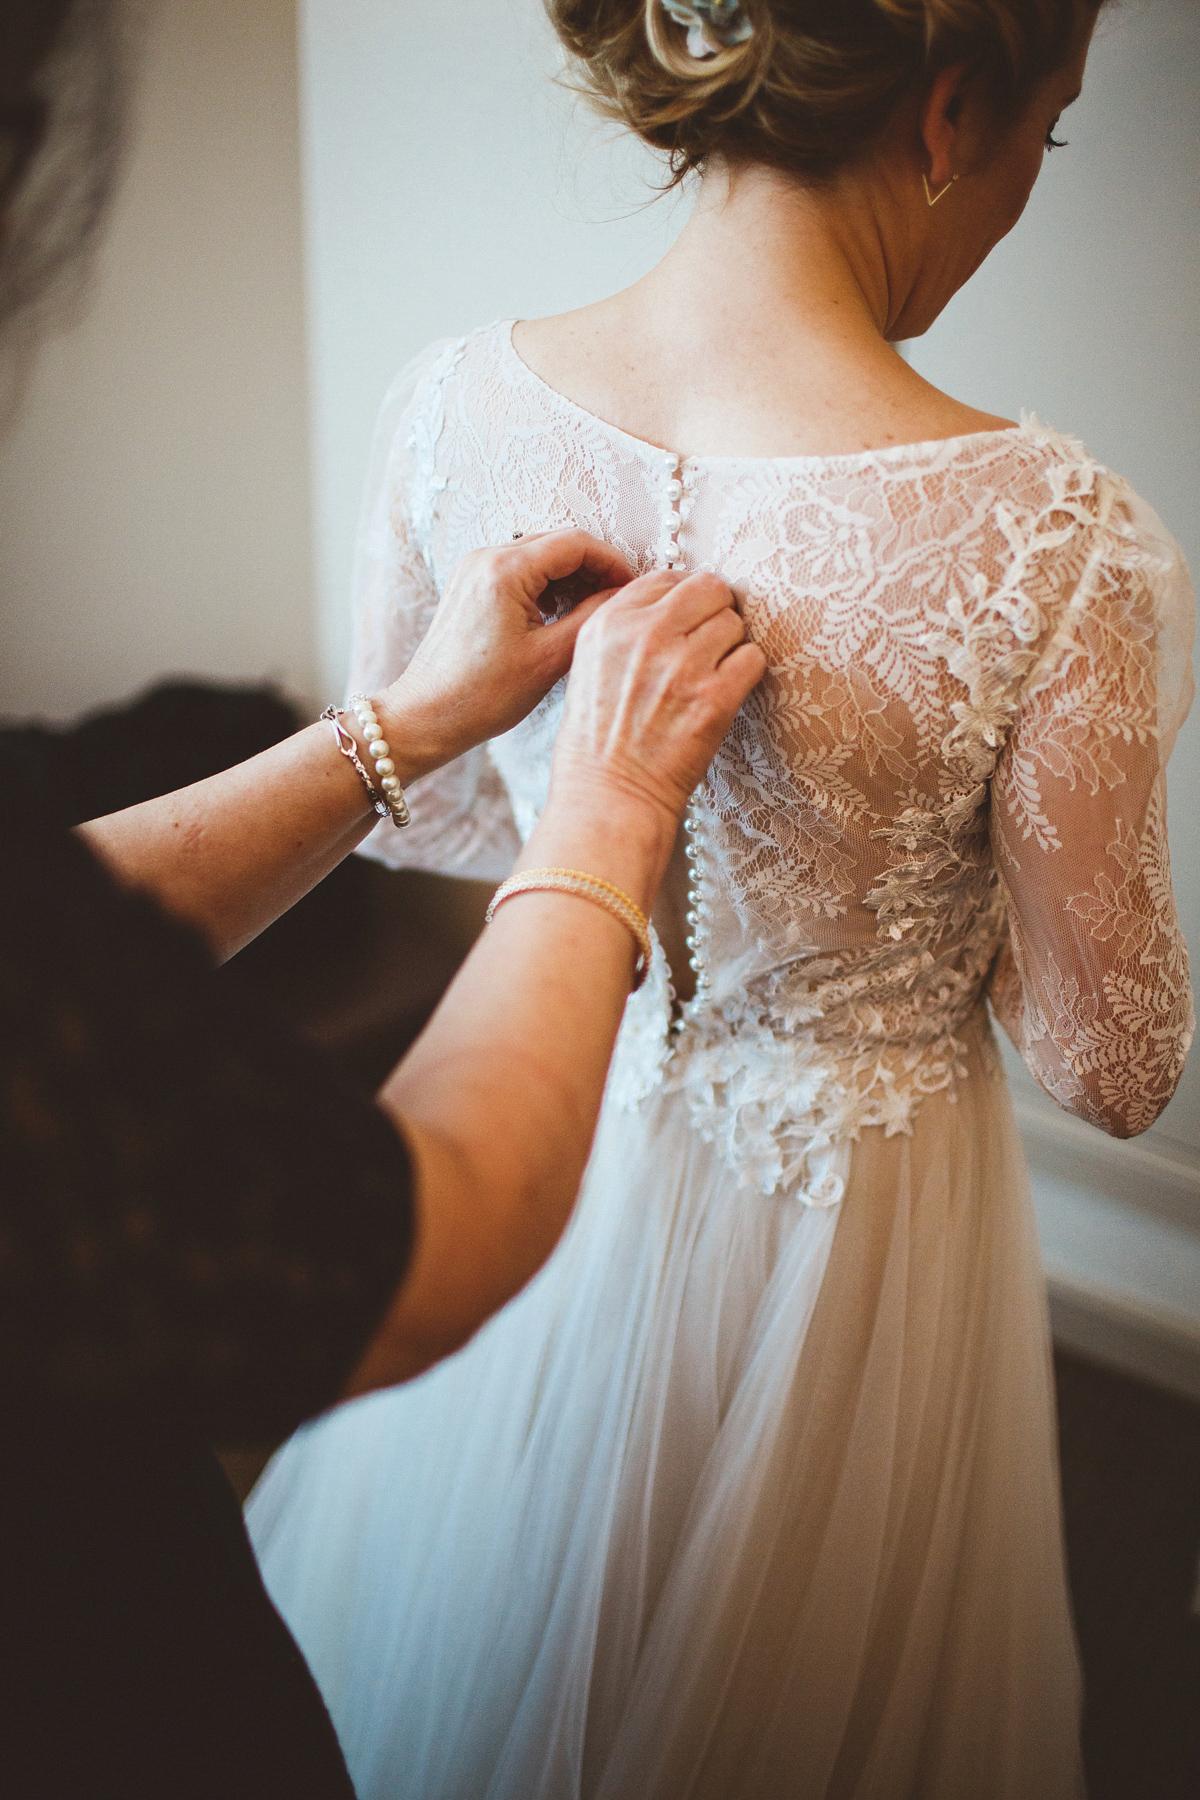 A BHLDN Dress and Velvet Flower Crown For an Industrial Inspired Winter Wedding (Weddings )